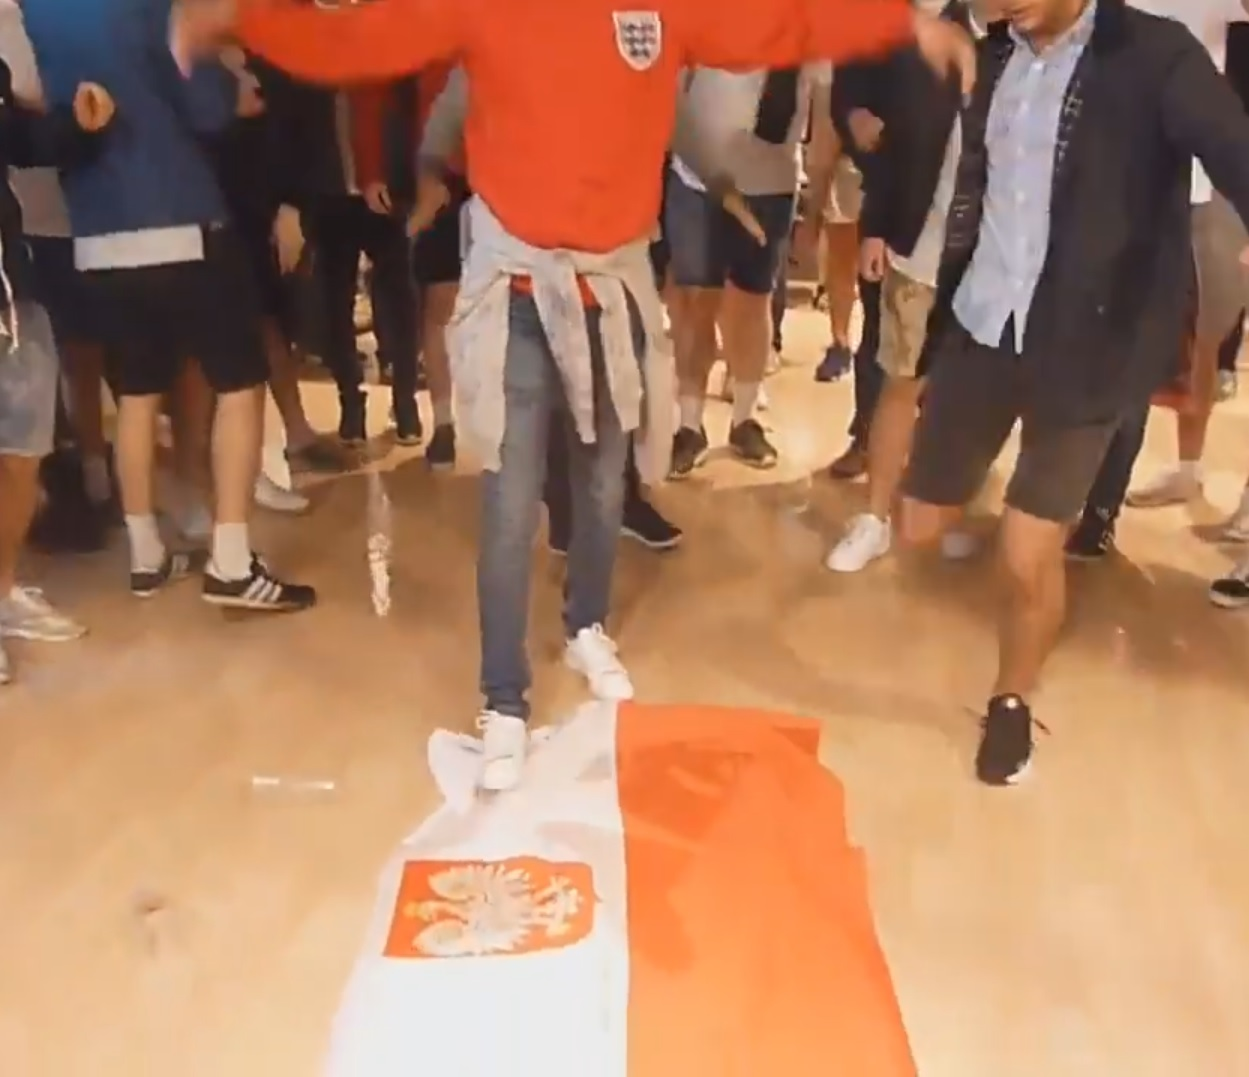 Skandal na EURO'16: Angielscy kibice depczą polską flagę (video)